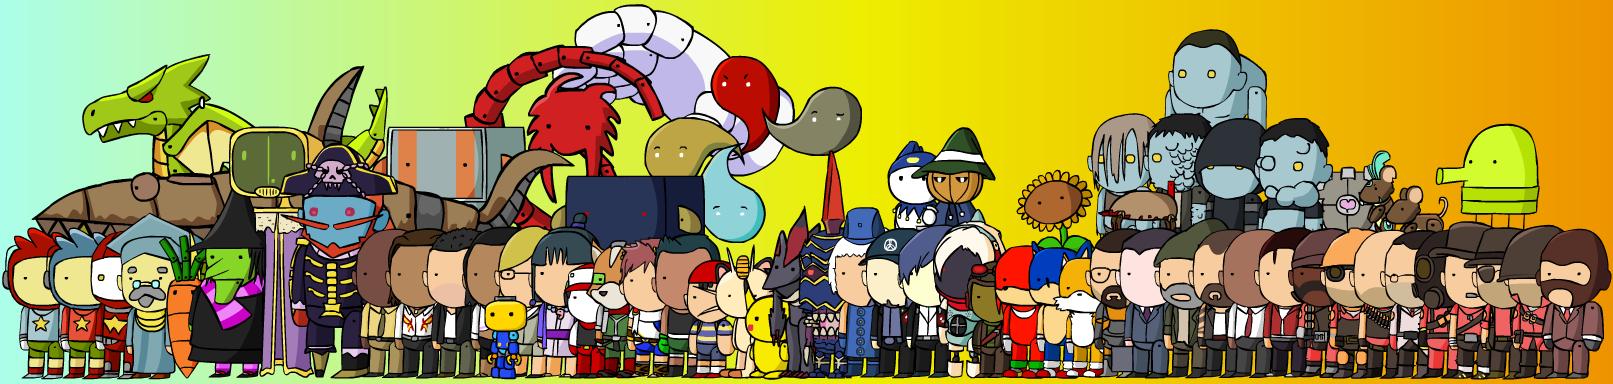 Drawing Scribblenauts : Scribblenauts vg characters by mcgenio on deviantart